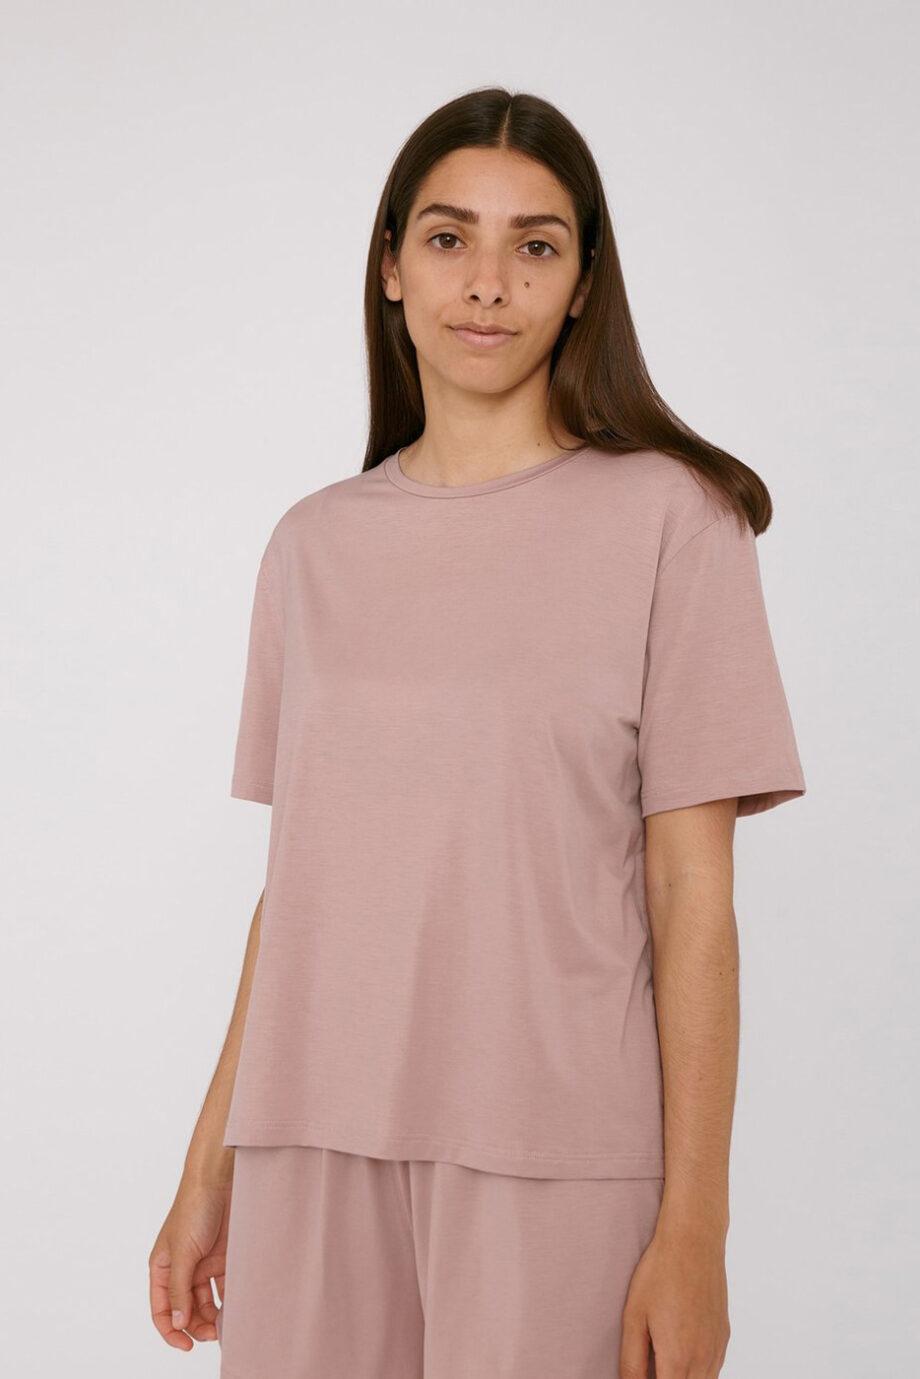 Organic Basics - T-shirt Tencel– Oud Roze_front